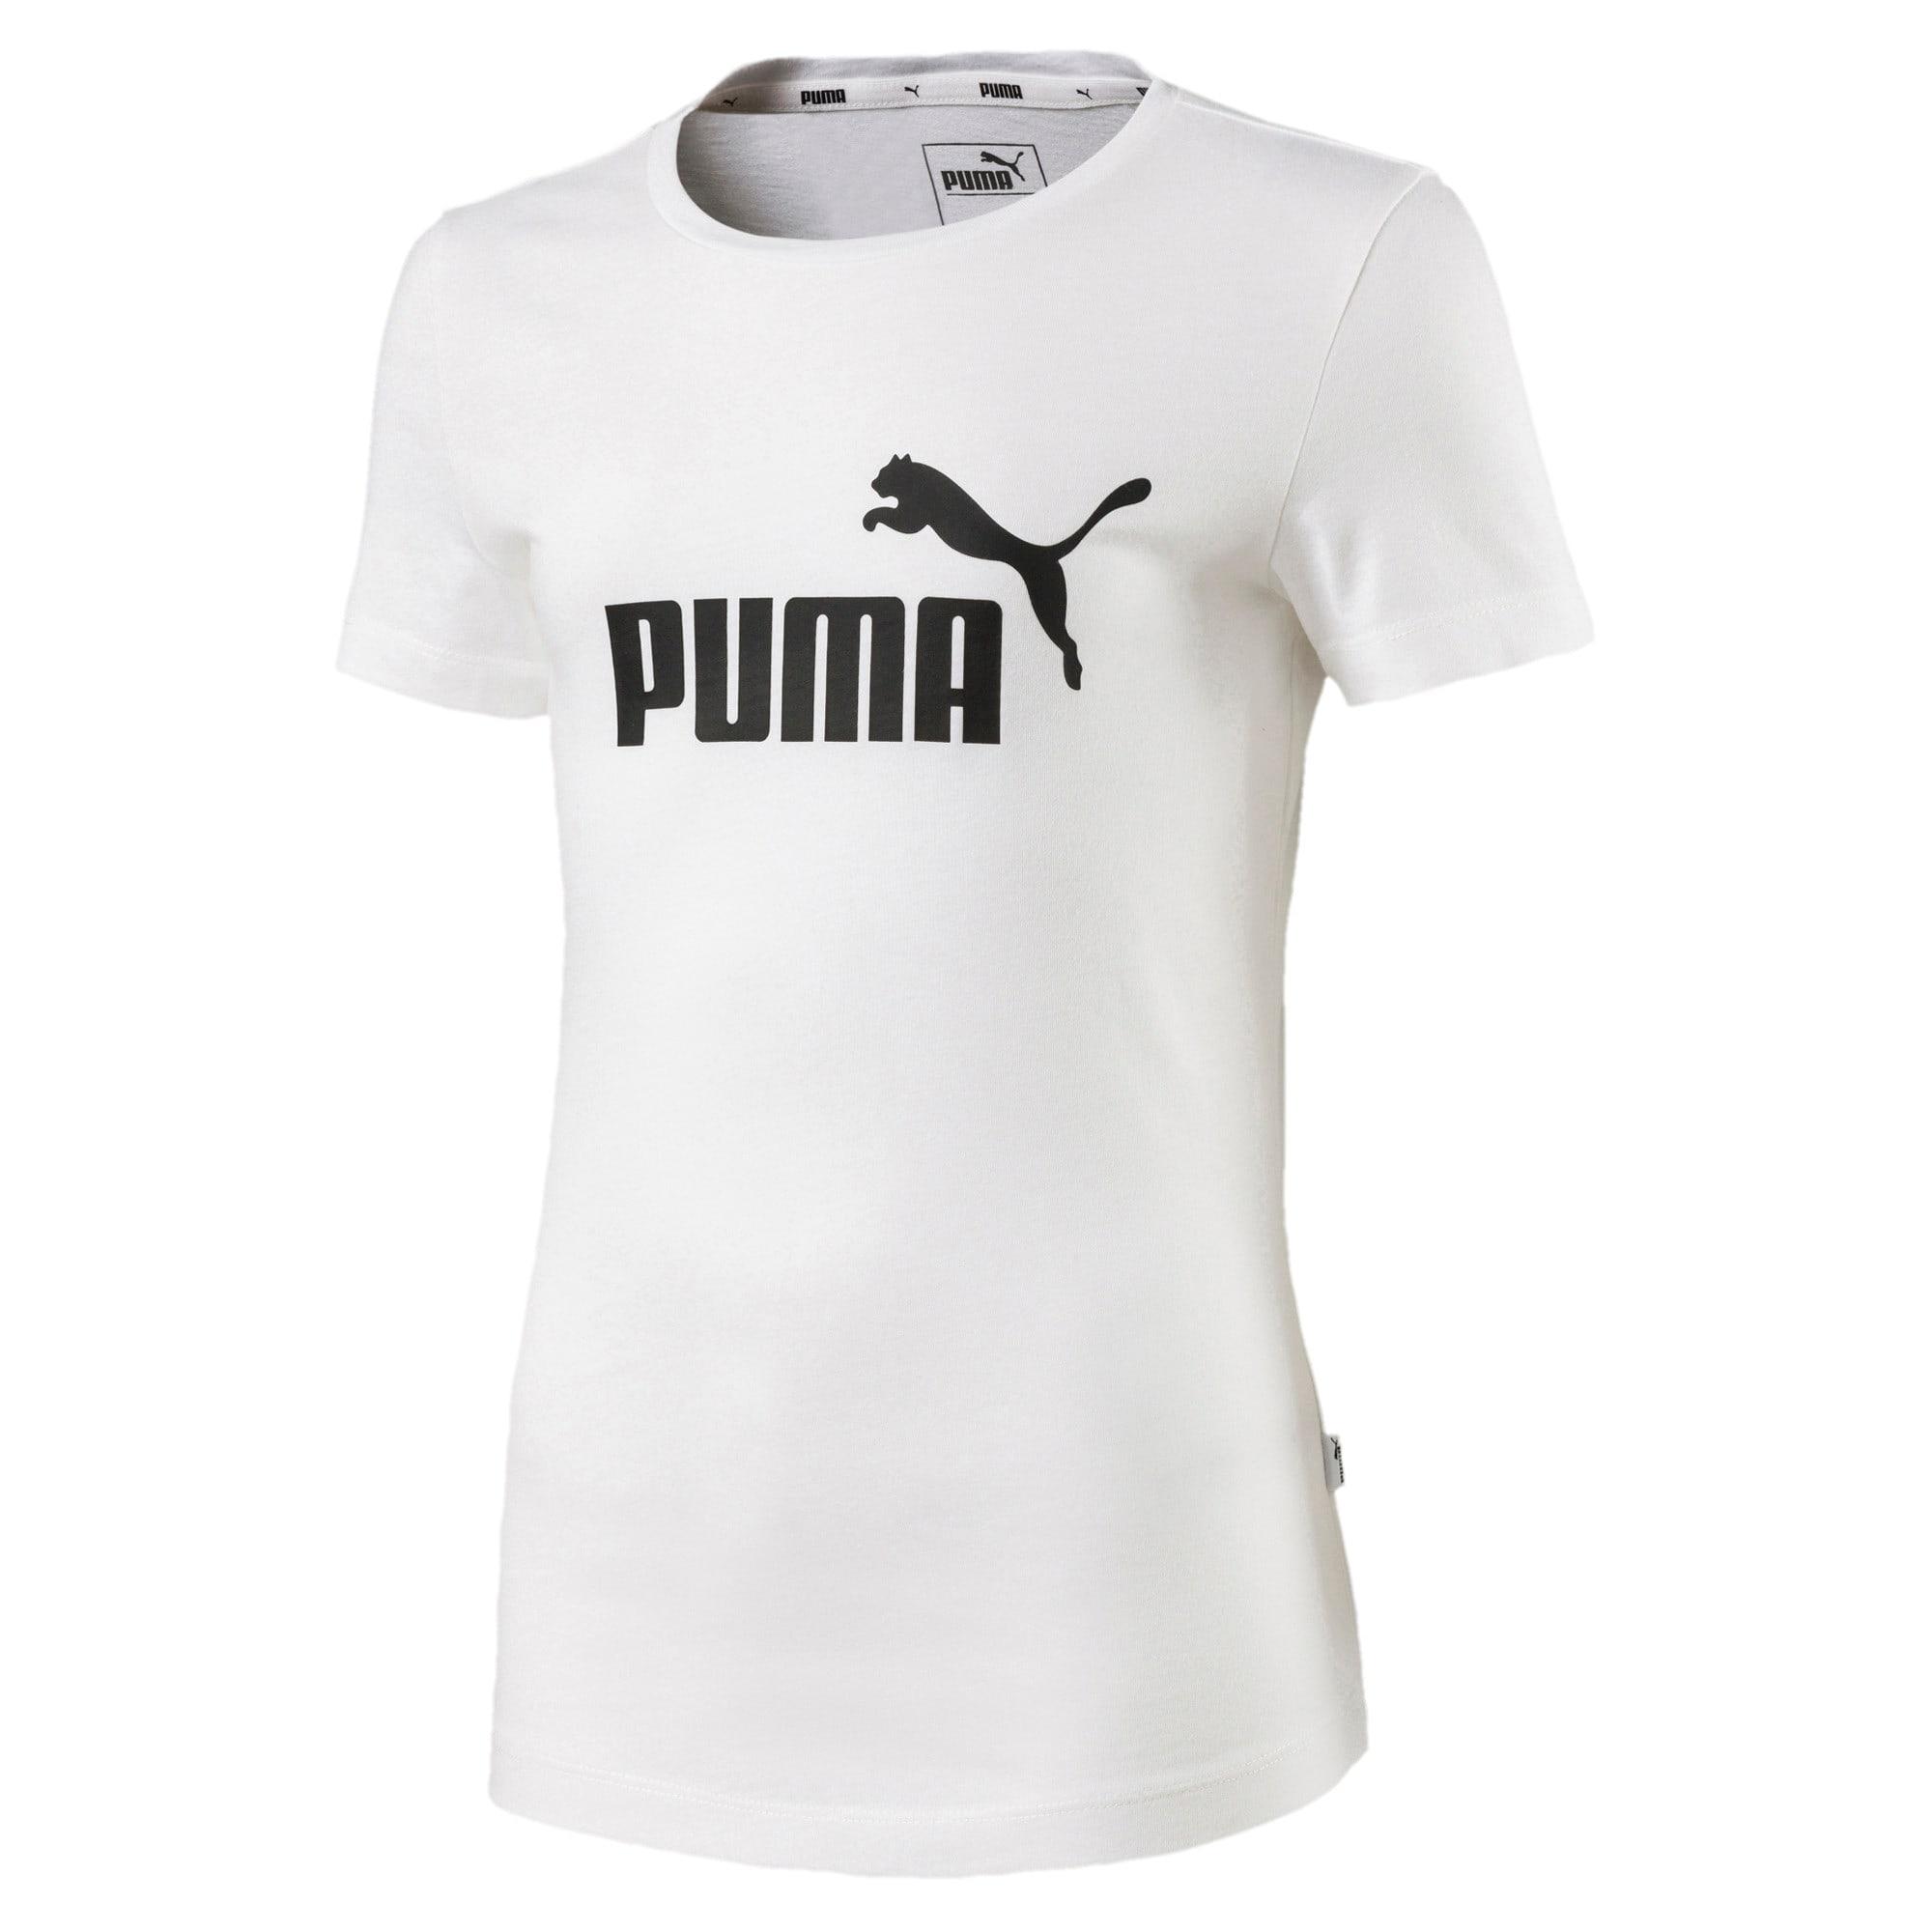 Thumbnail 1 of Essentials Girls' Tee, Puma White, medium